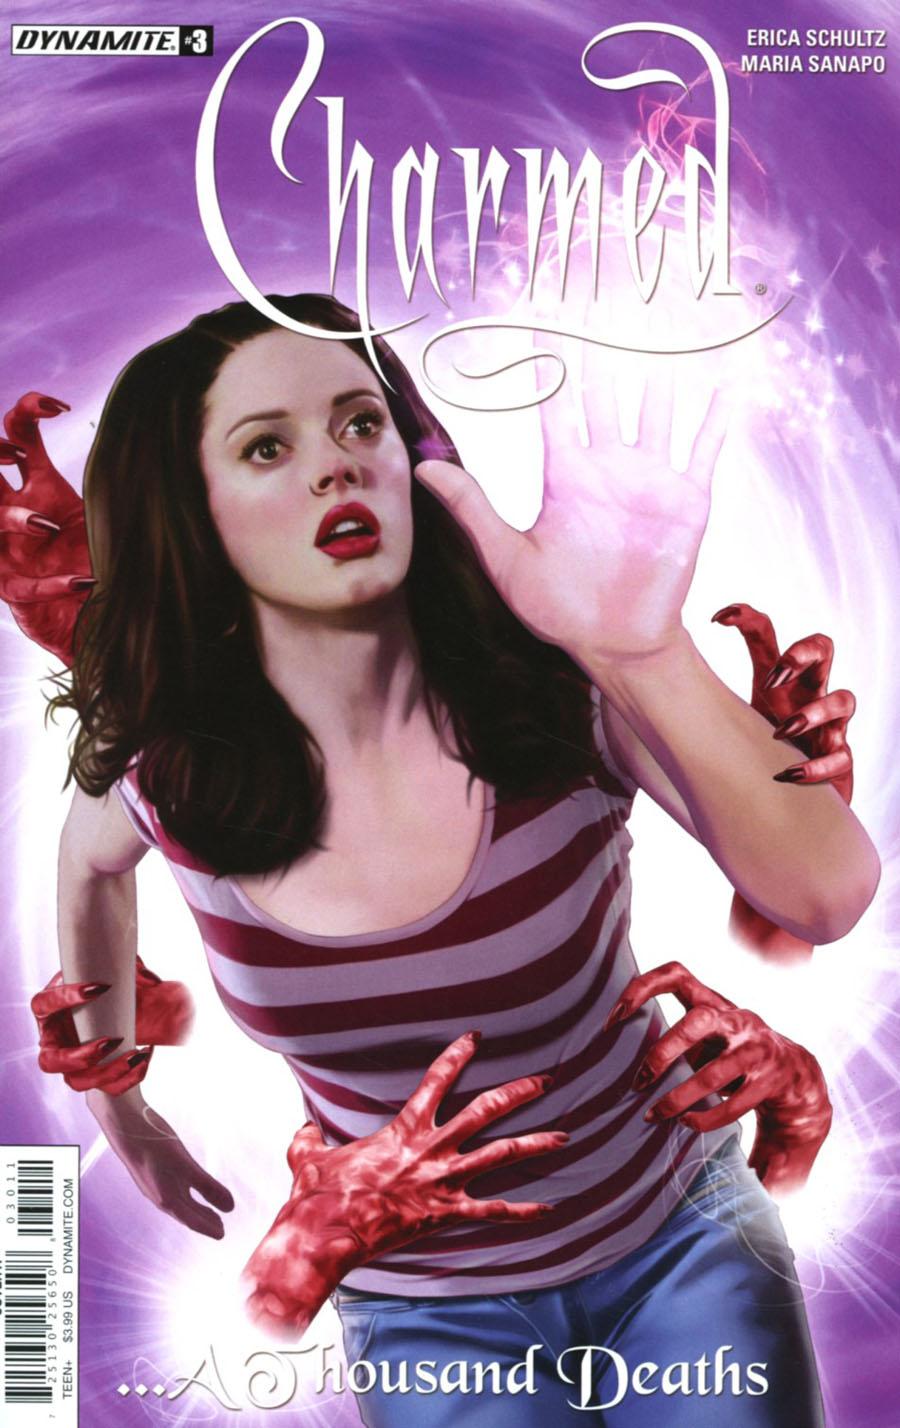 Charmed Vol 2 #3 Cover A Regular Joe Corroney Cover